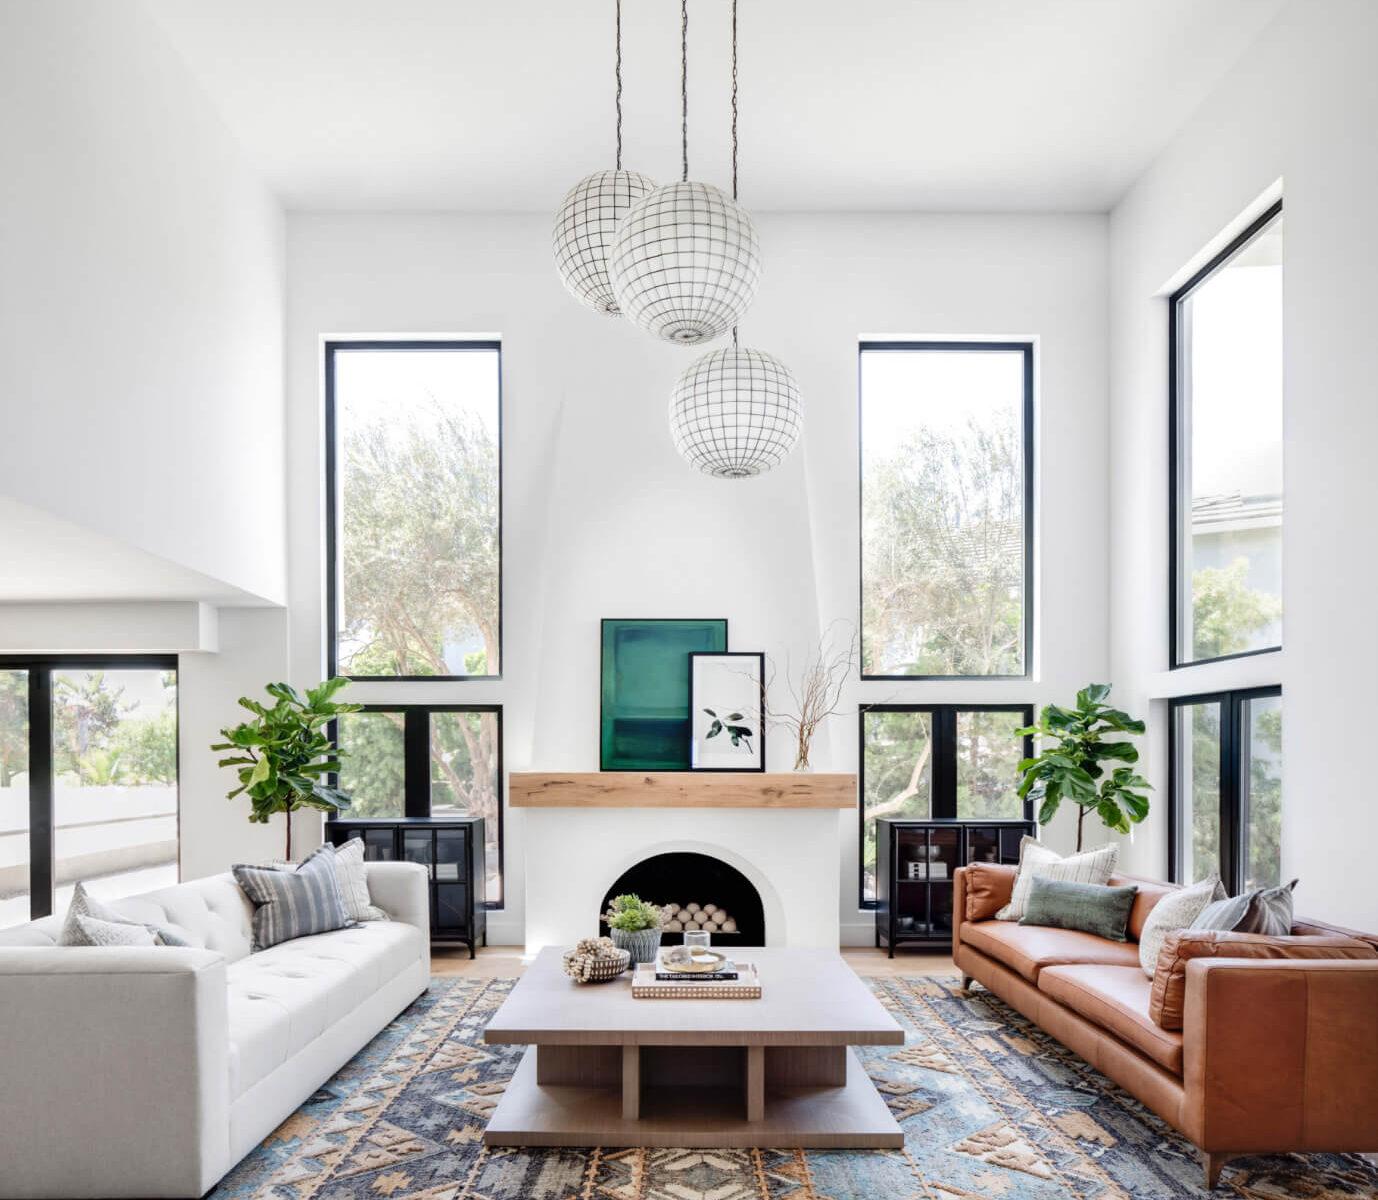 Spanish Modern: Living Room Reveal - Lindye Galloway